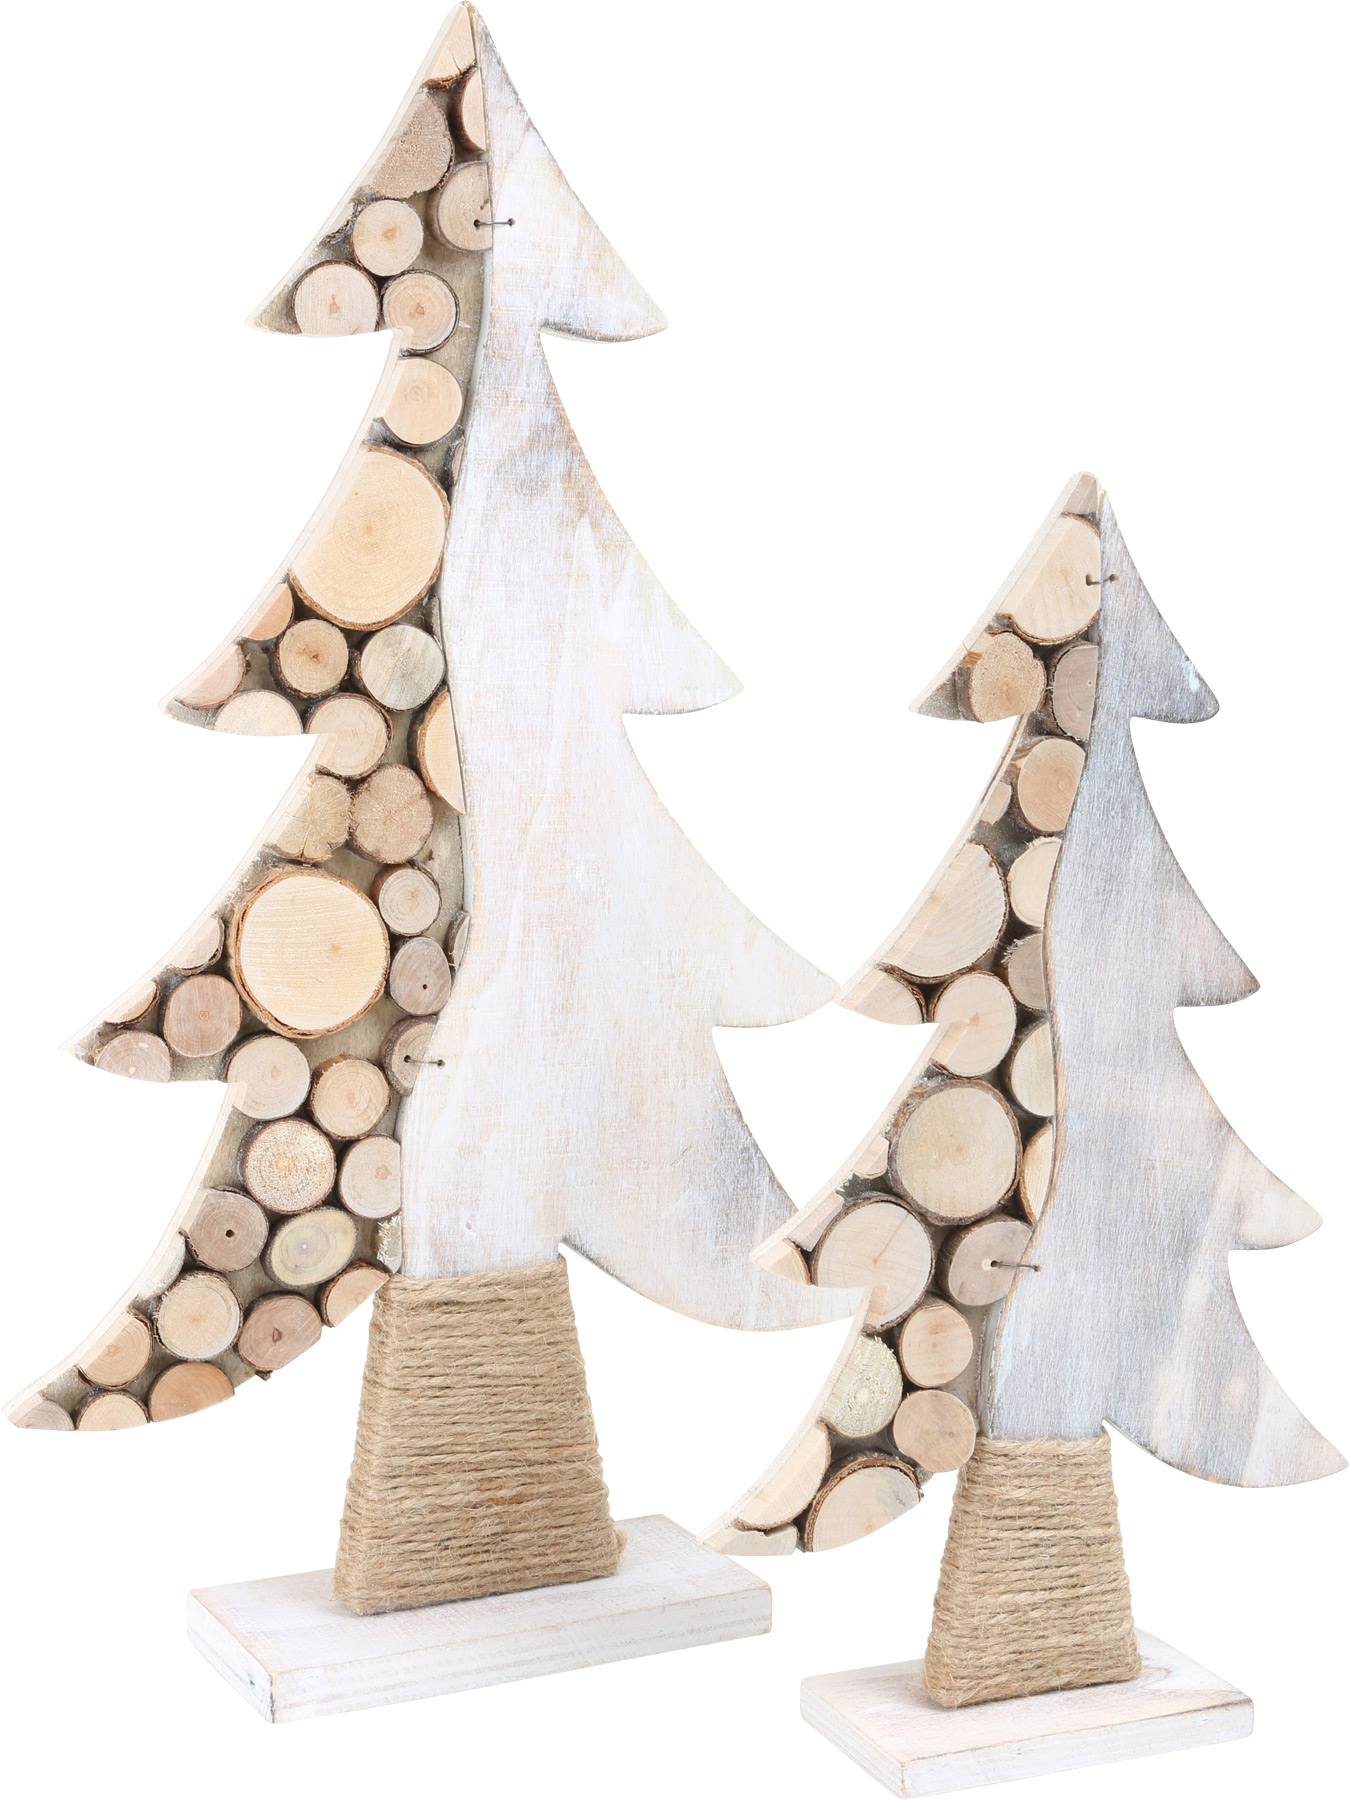 Kalėdinė dekoracija SMALL FOOT Eglutės, 2 vnt.